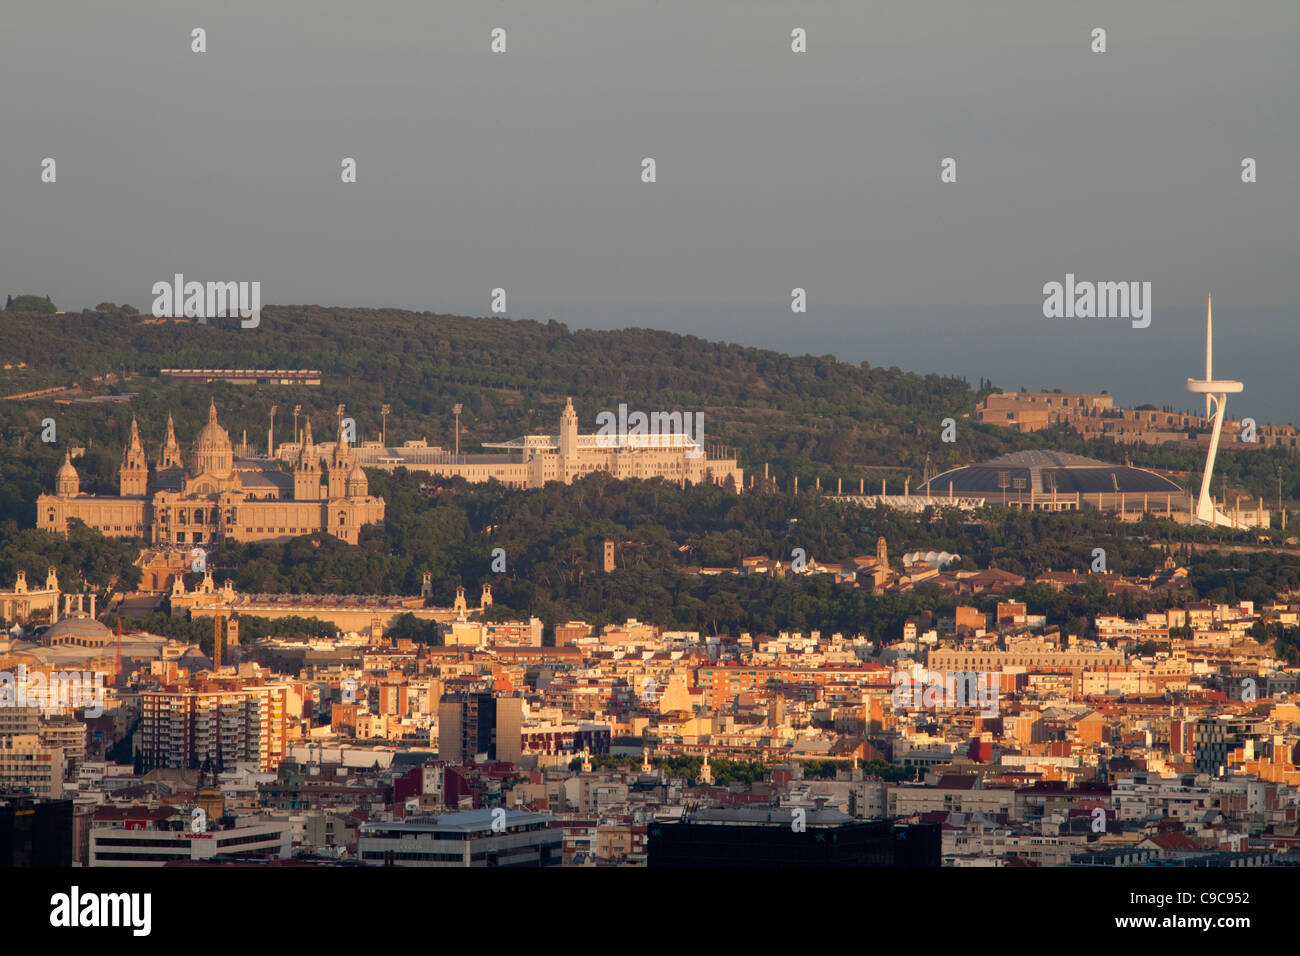 View of Montjuic, Barcelona, Spain - Stock Image